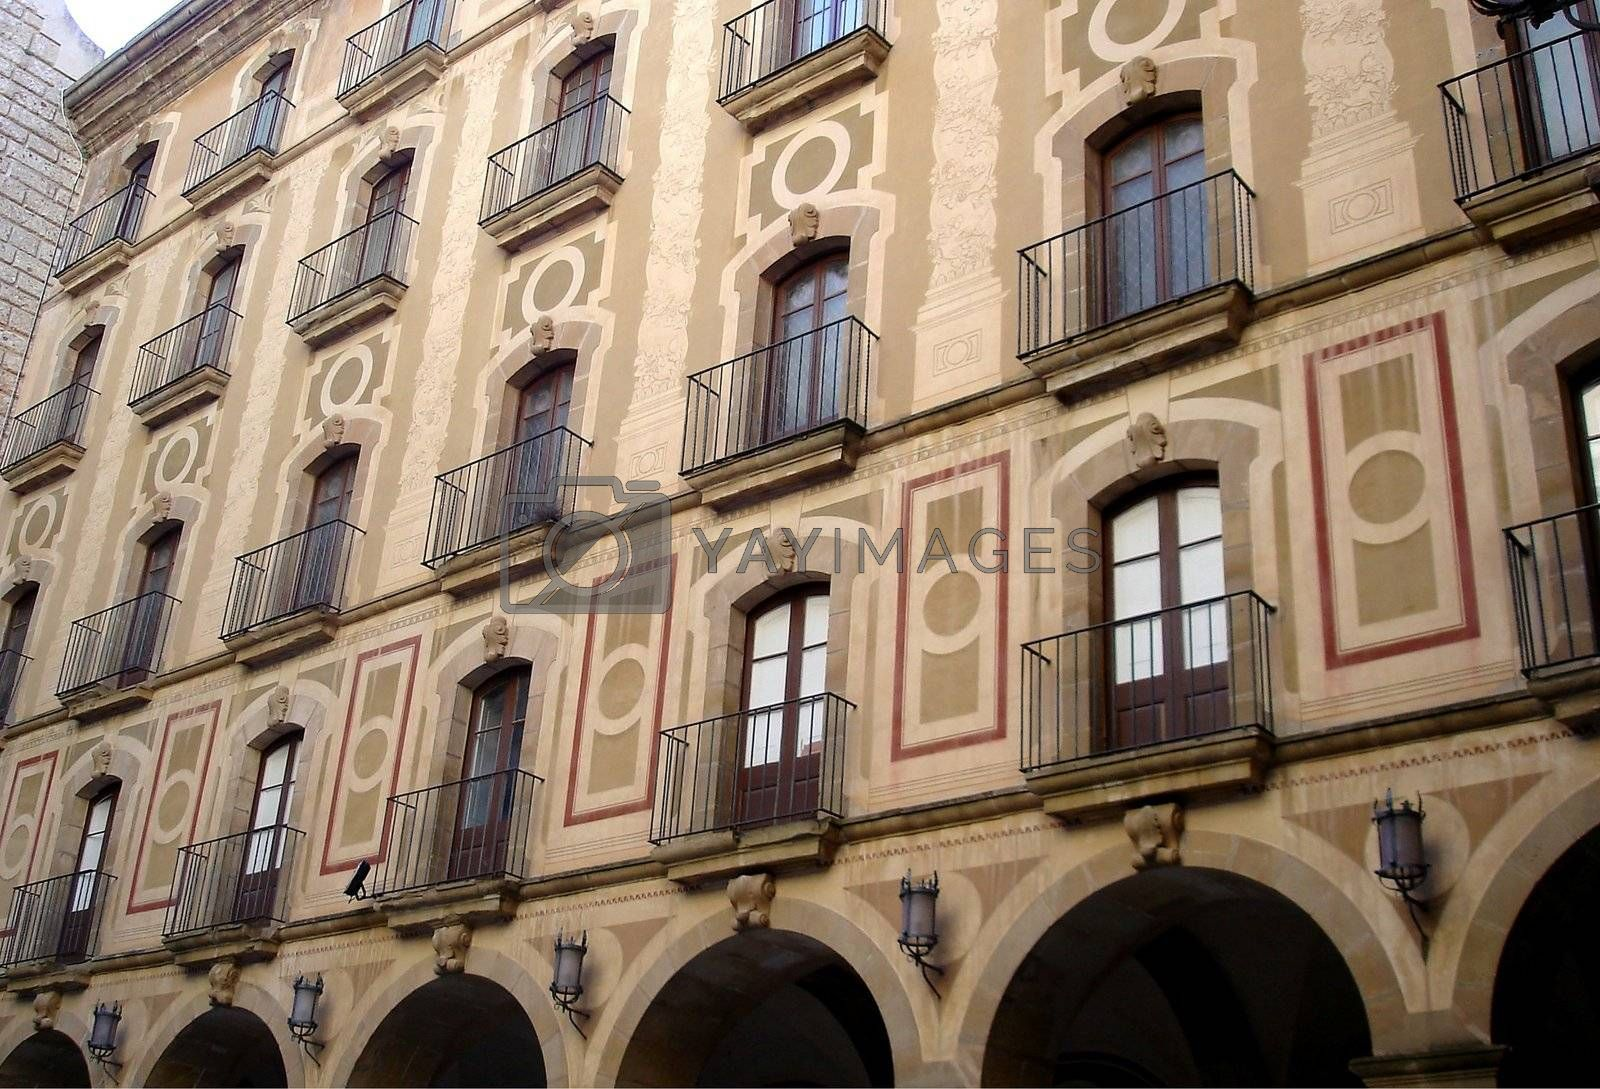 View of balconies on building in Barcelona